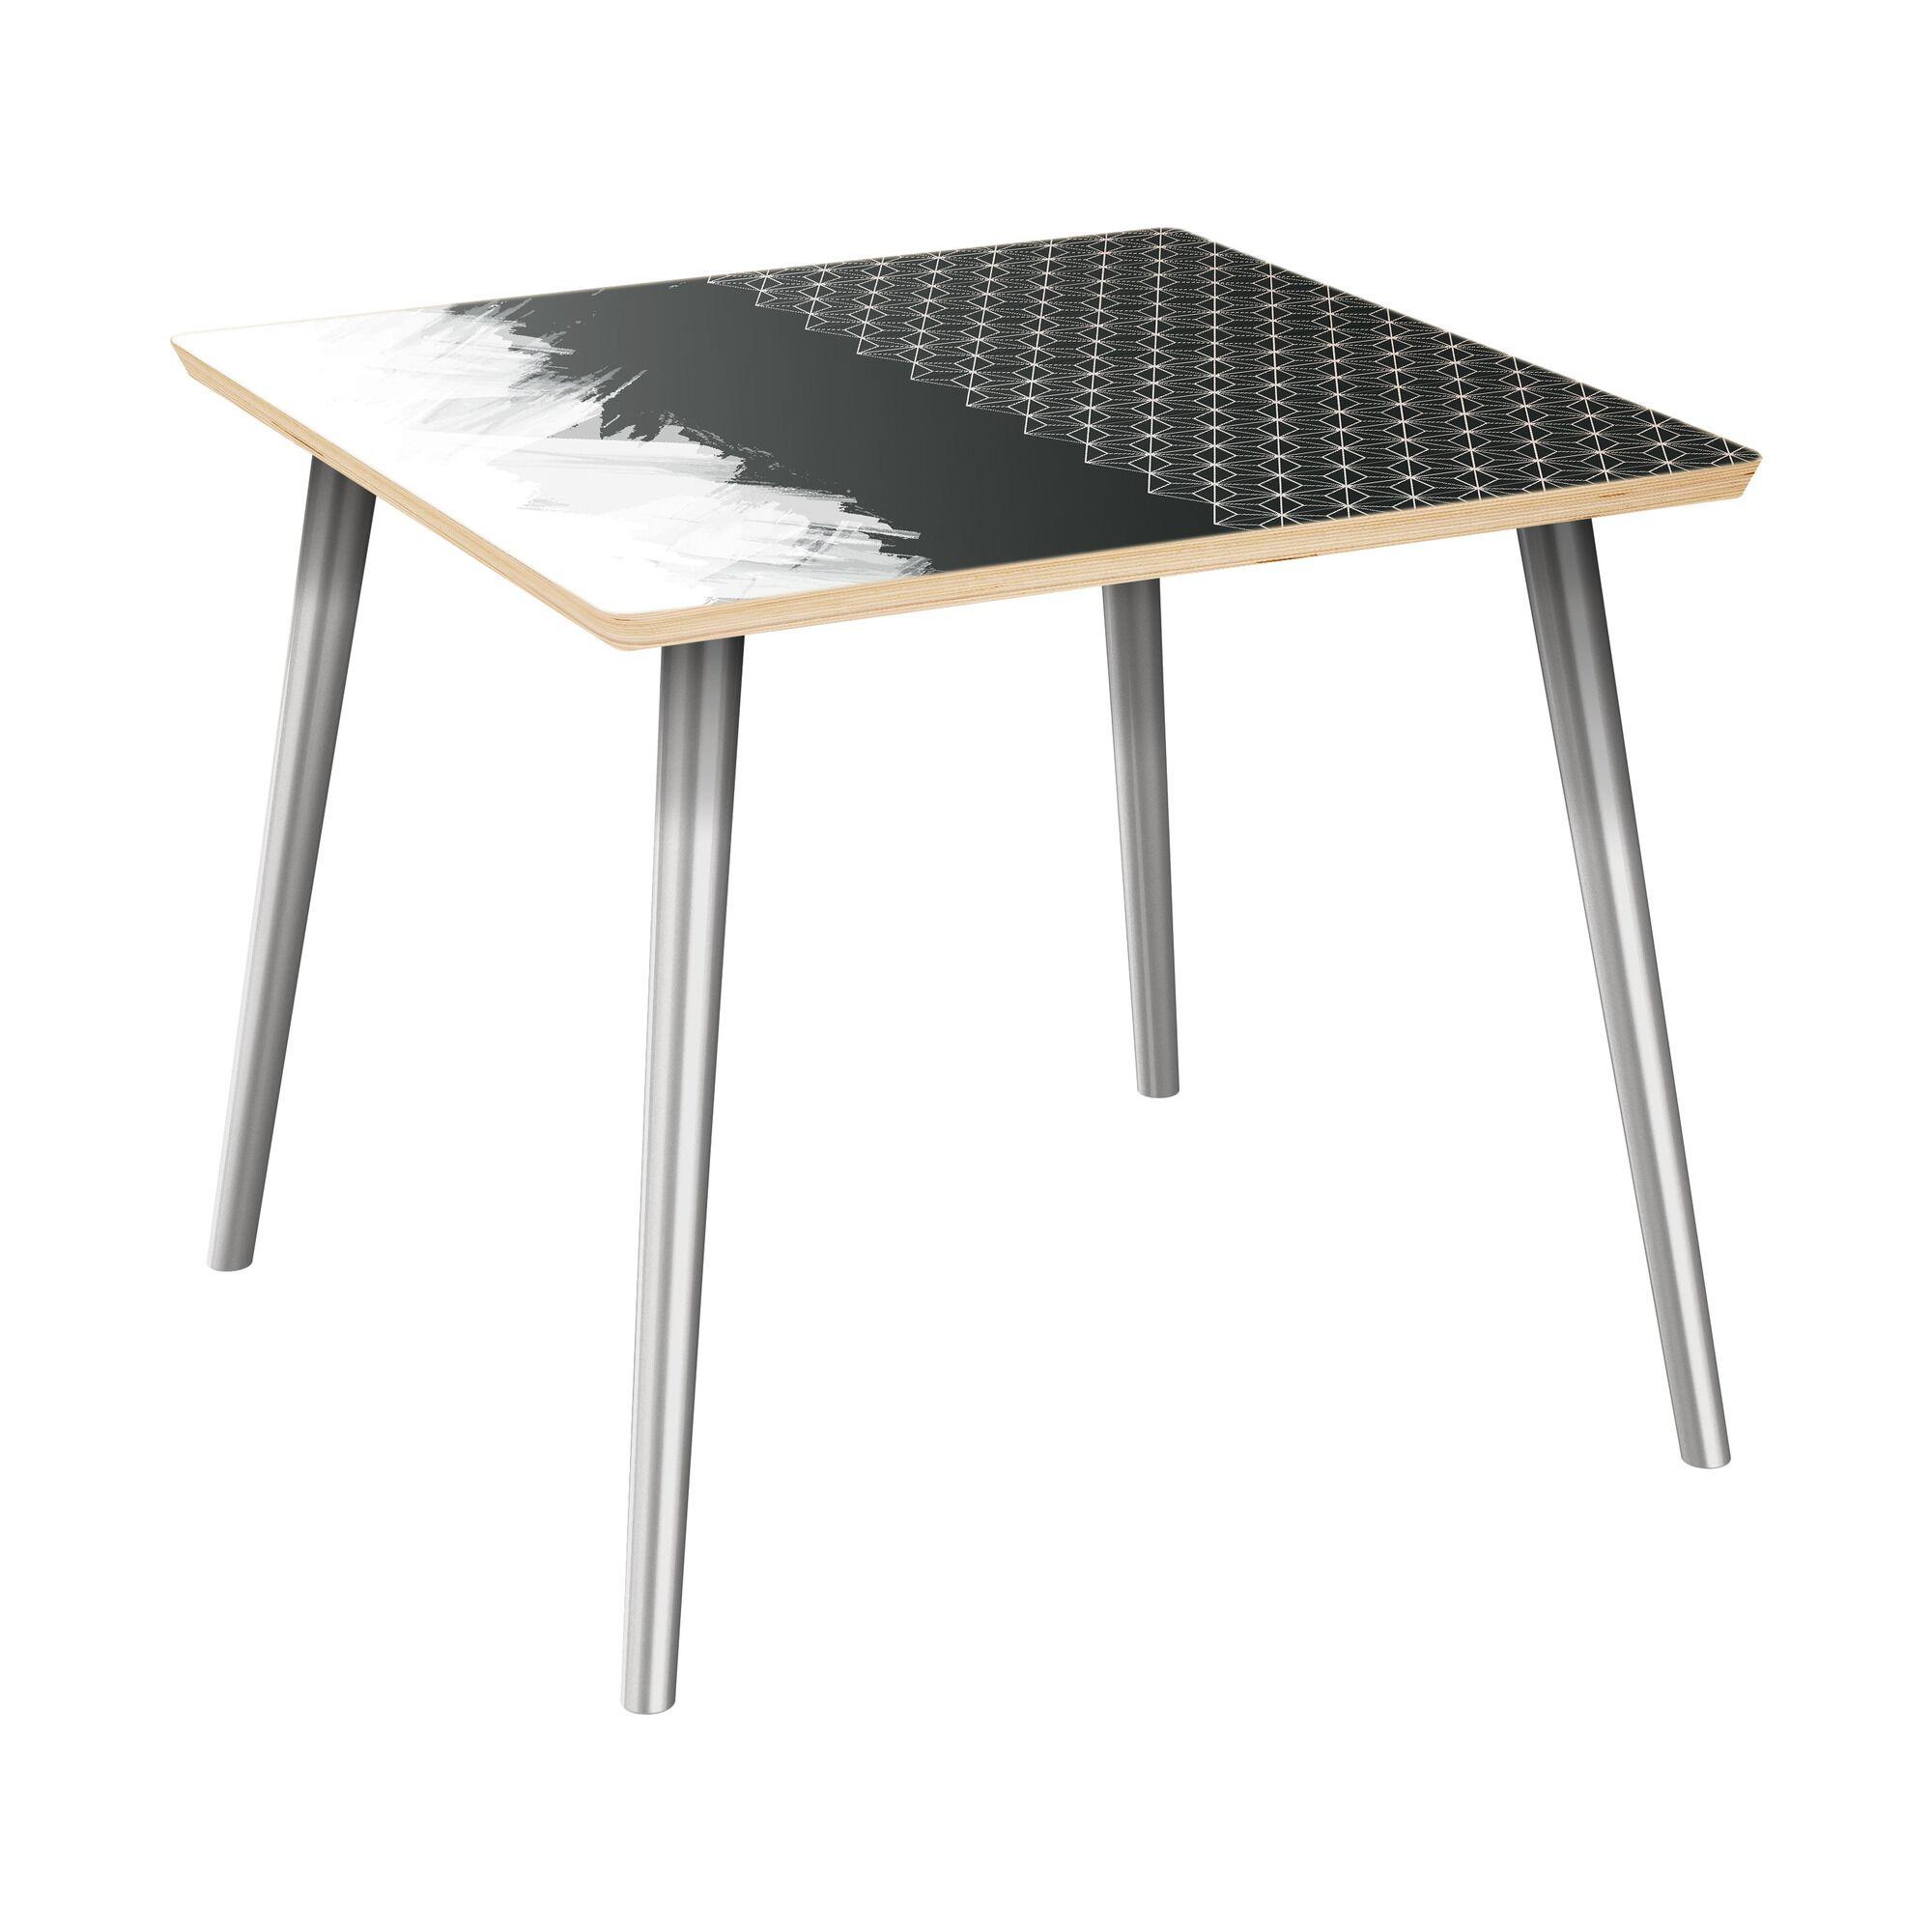 Ewalt End Table Table Top Color: Natural, Table Base Color: Chrome